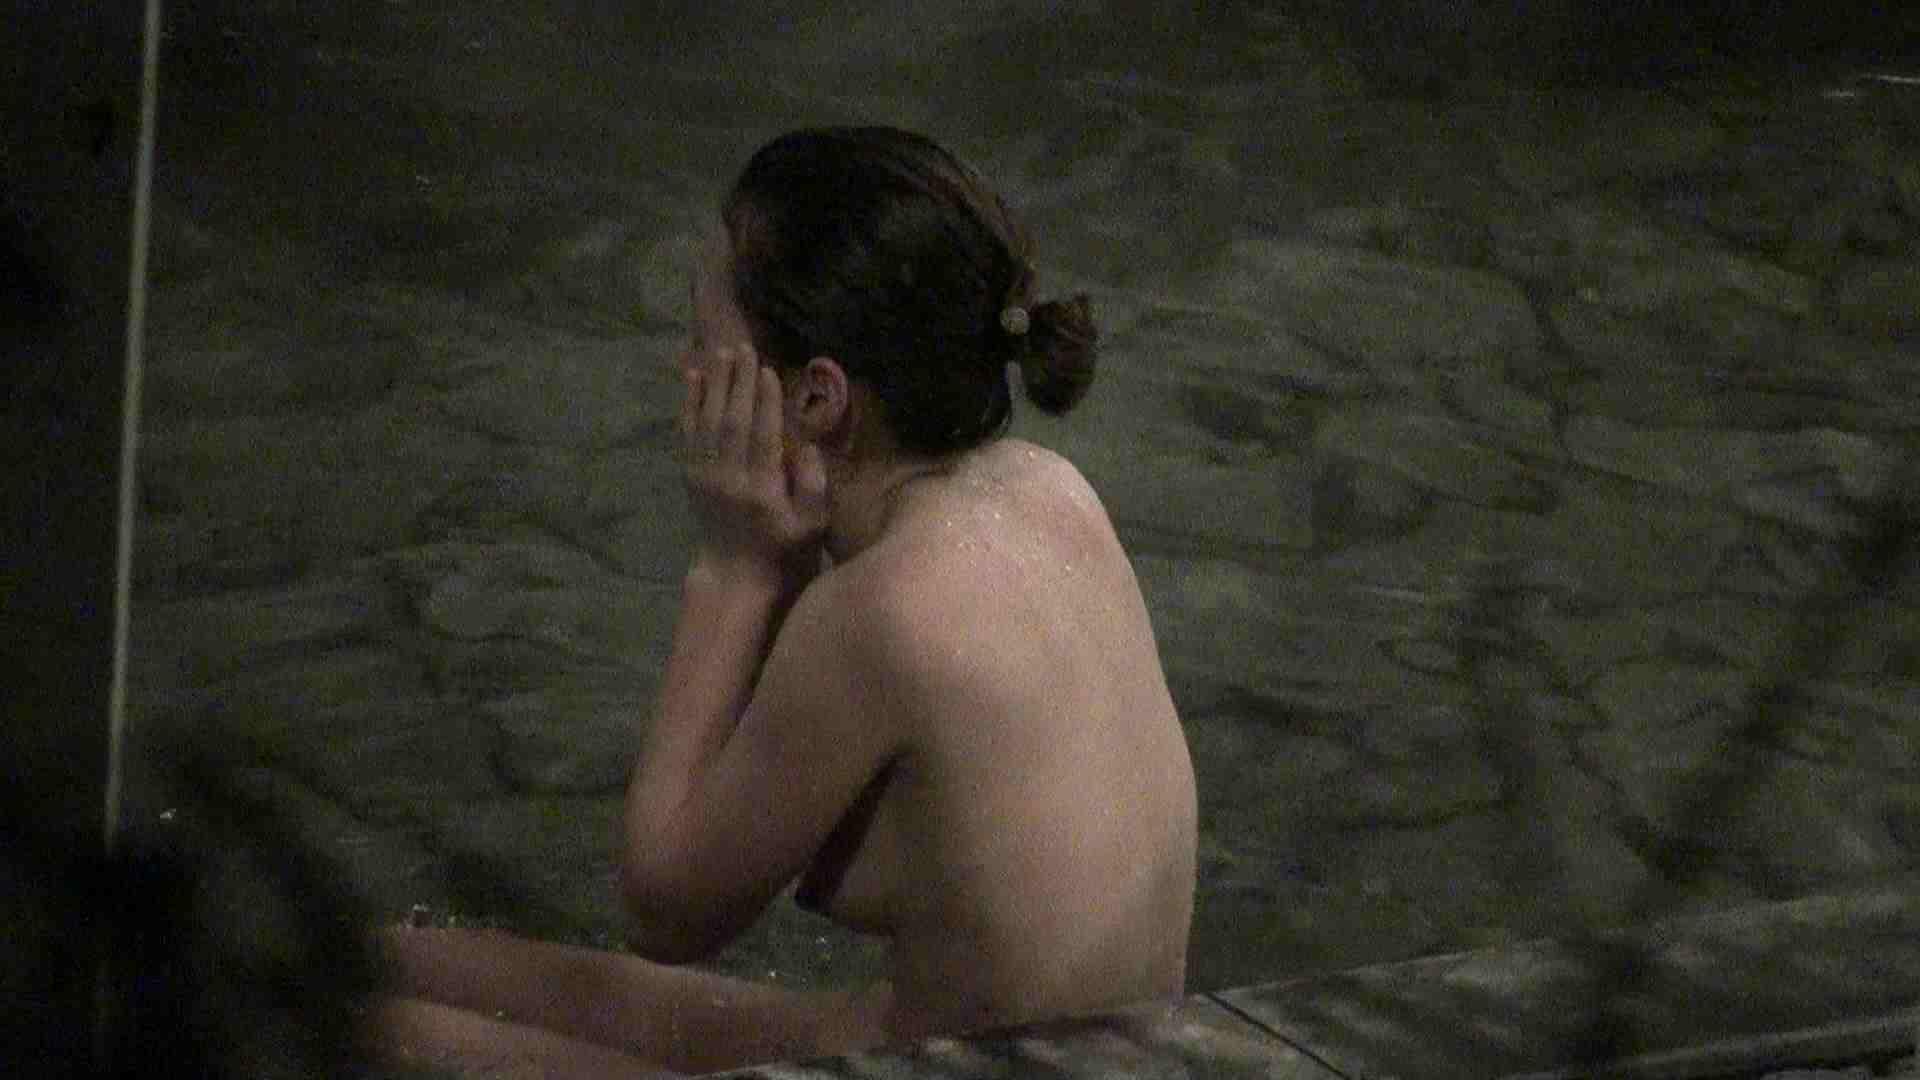 Aquaな露天風呂Vol.391 美しいOLの裸体 えろ無修正画像 99pic 89